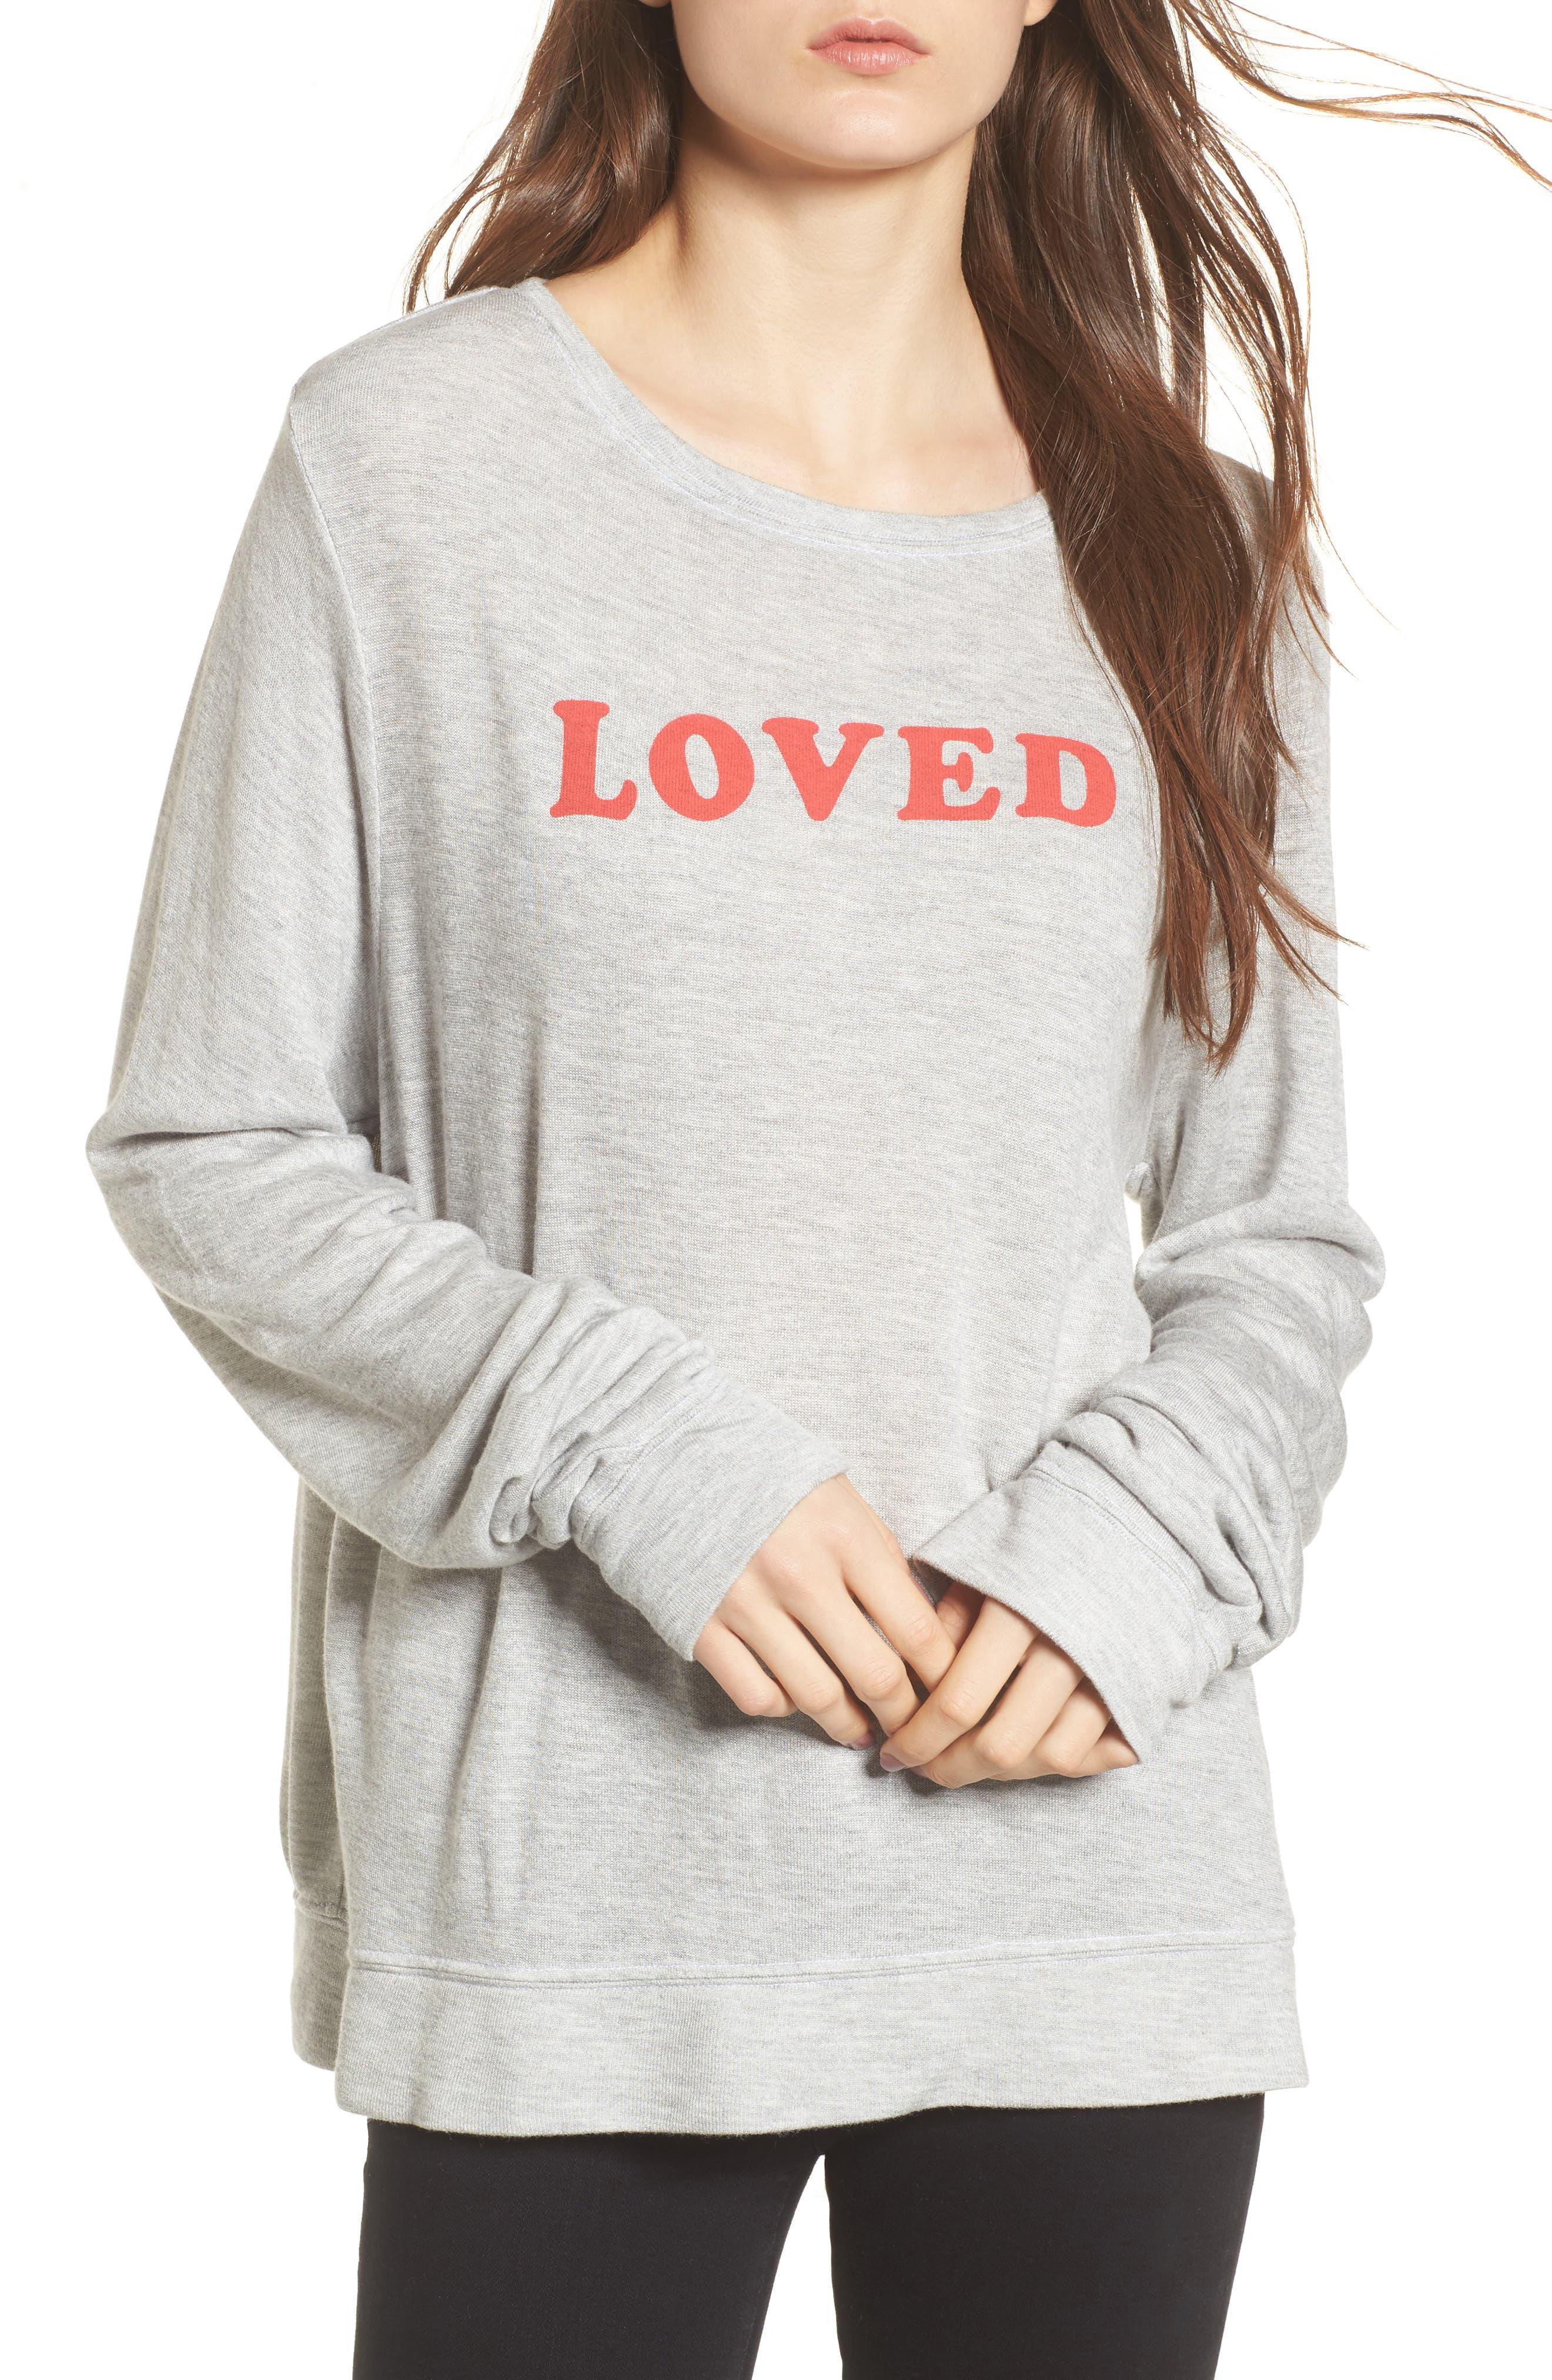 Main Image - Wildfox Loved Sweatshirt